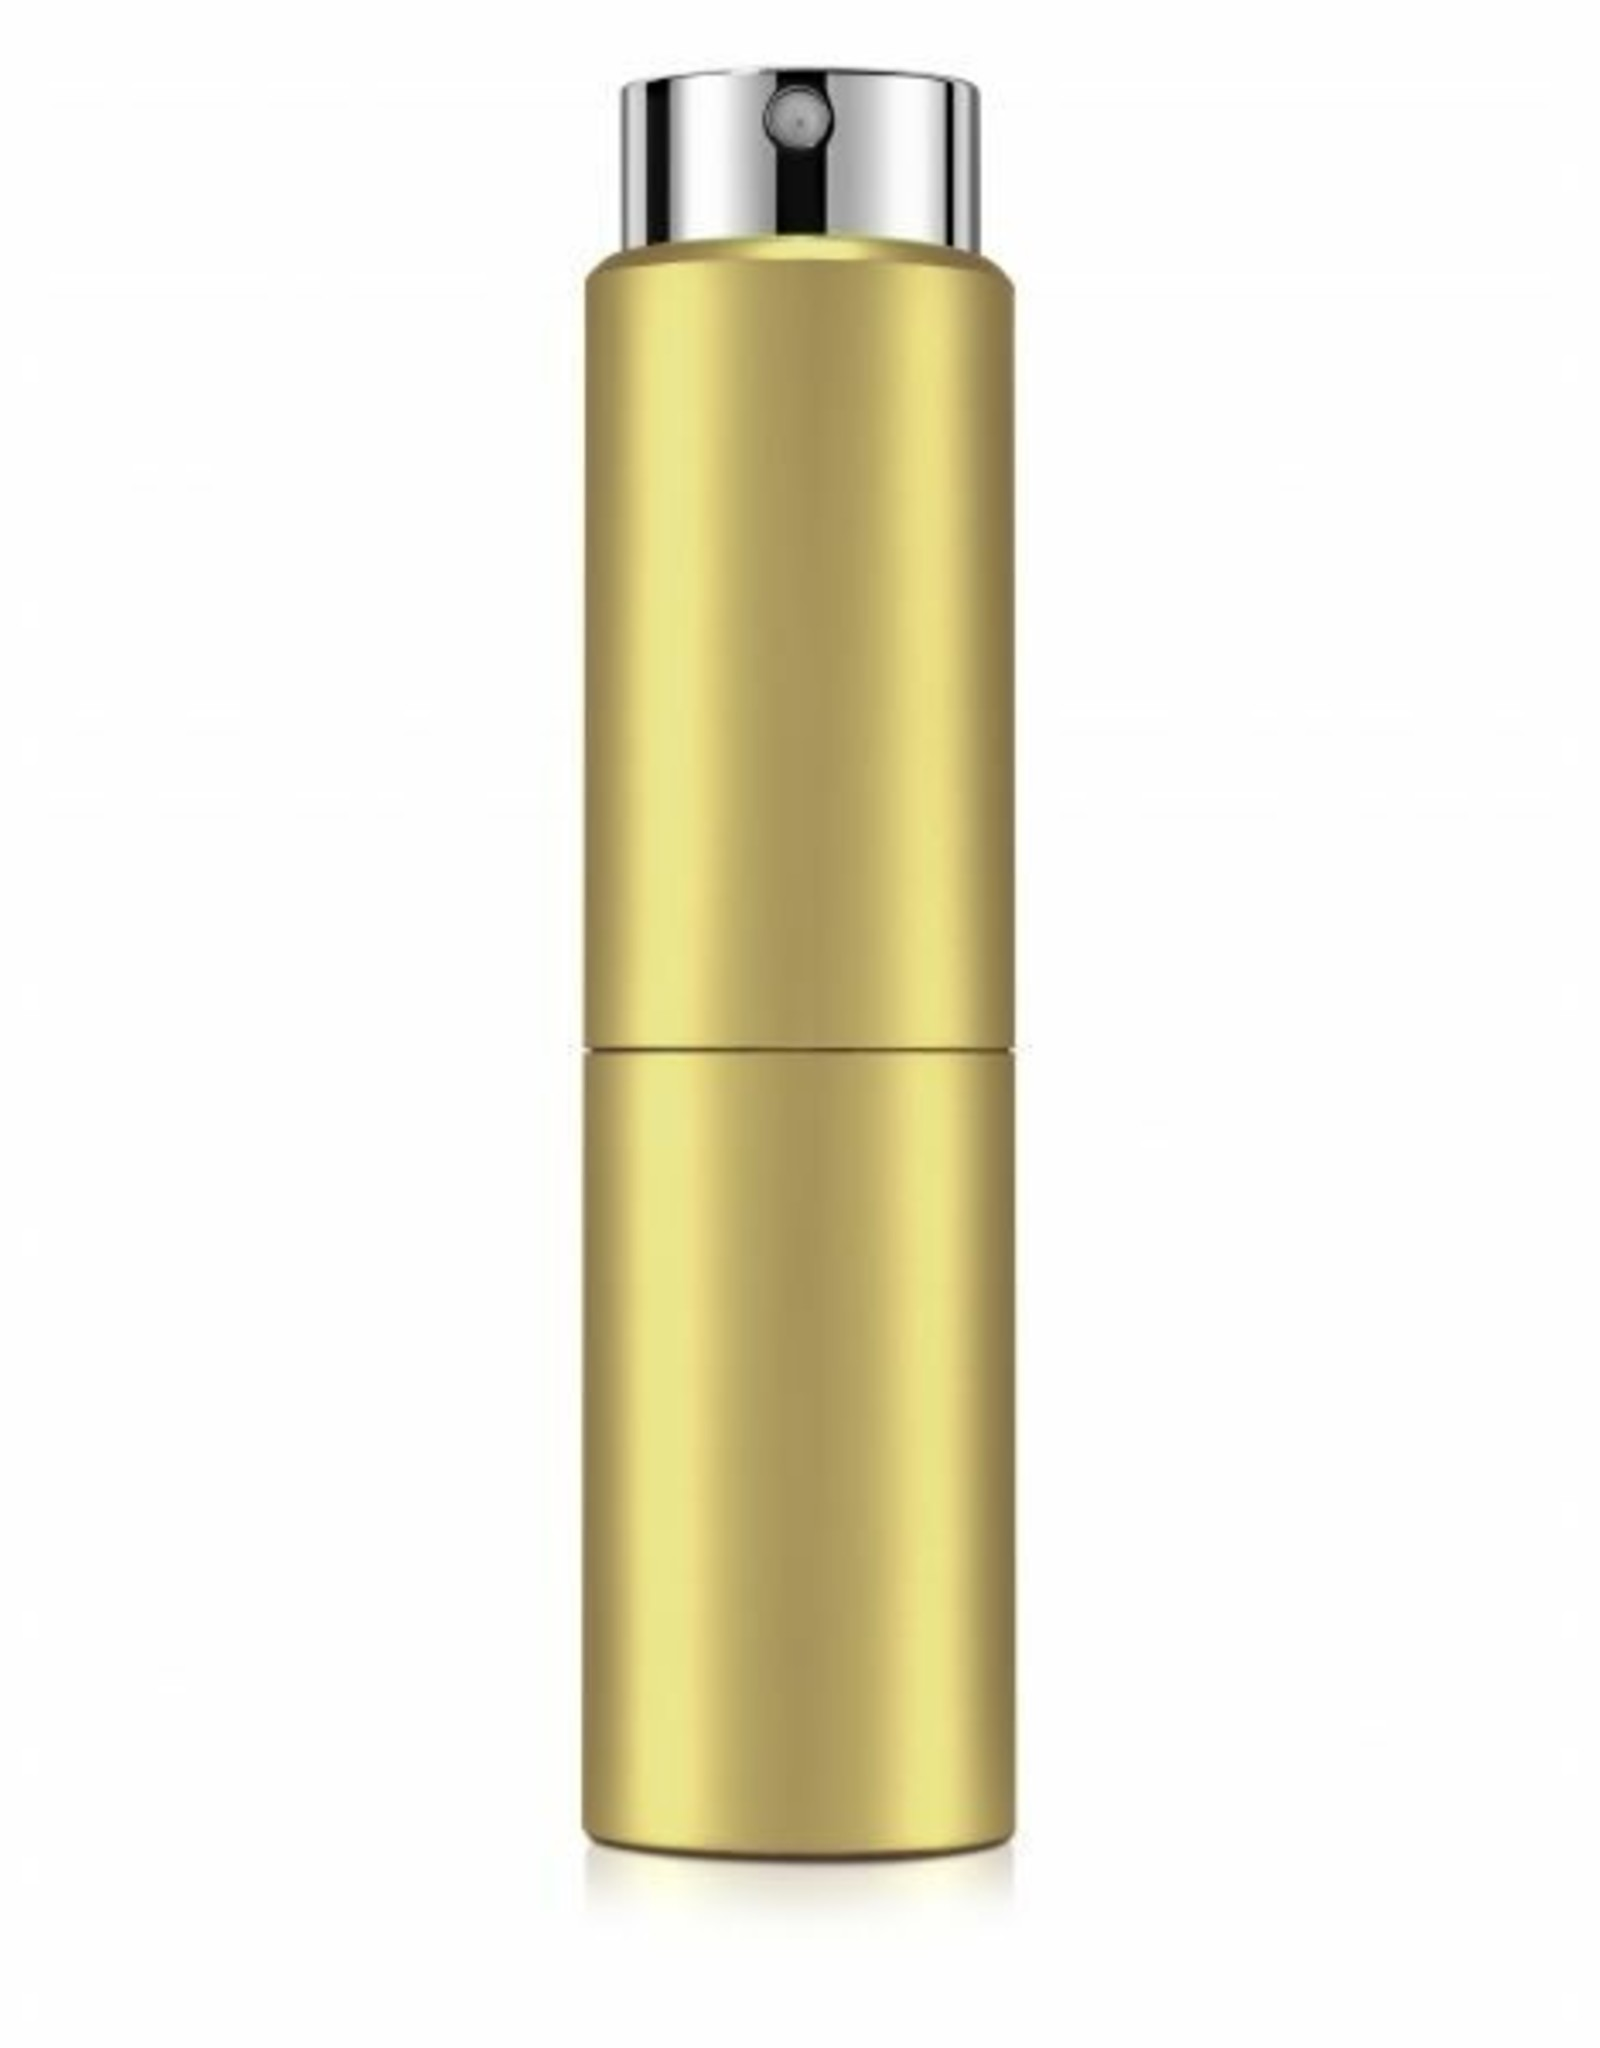 Equivalenza Gold Perfume Atomizer - 15ml